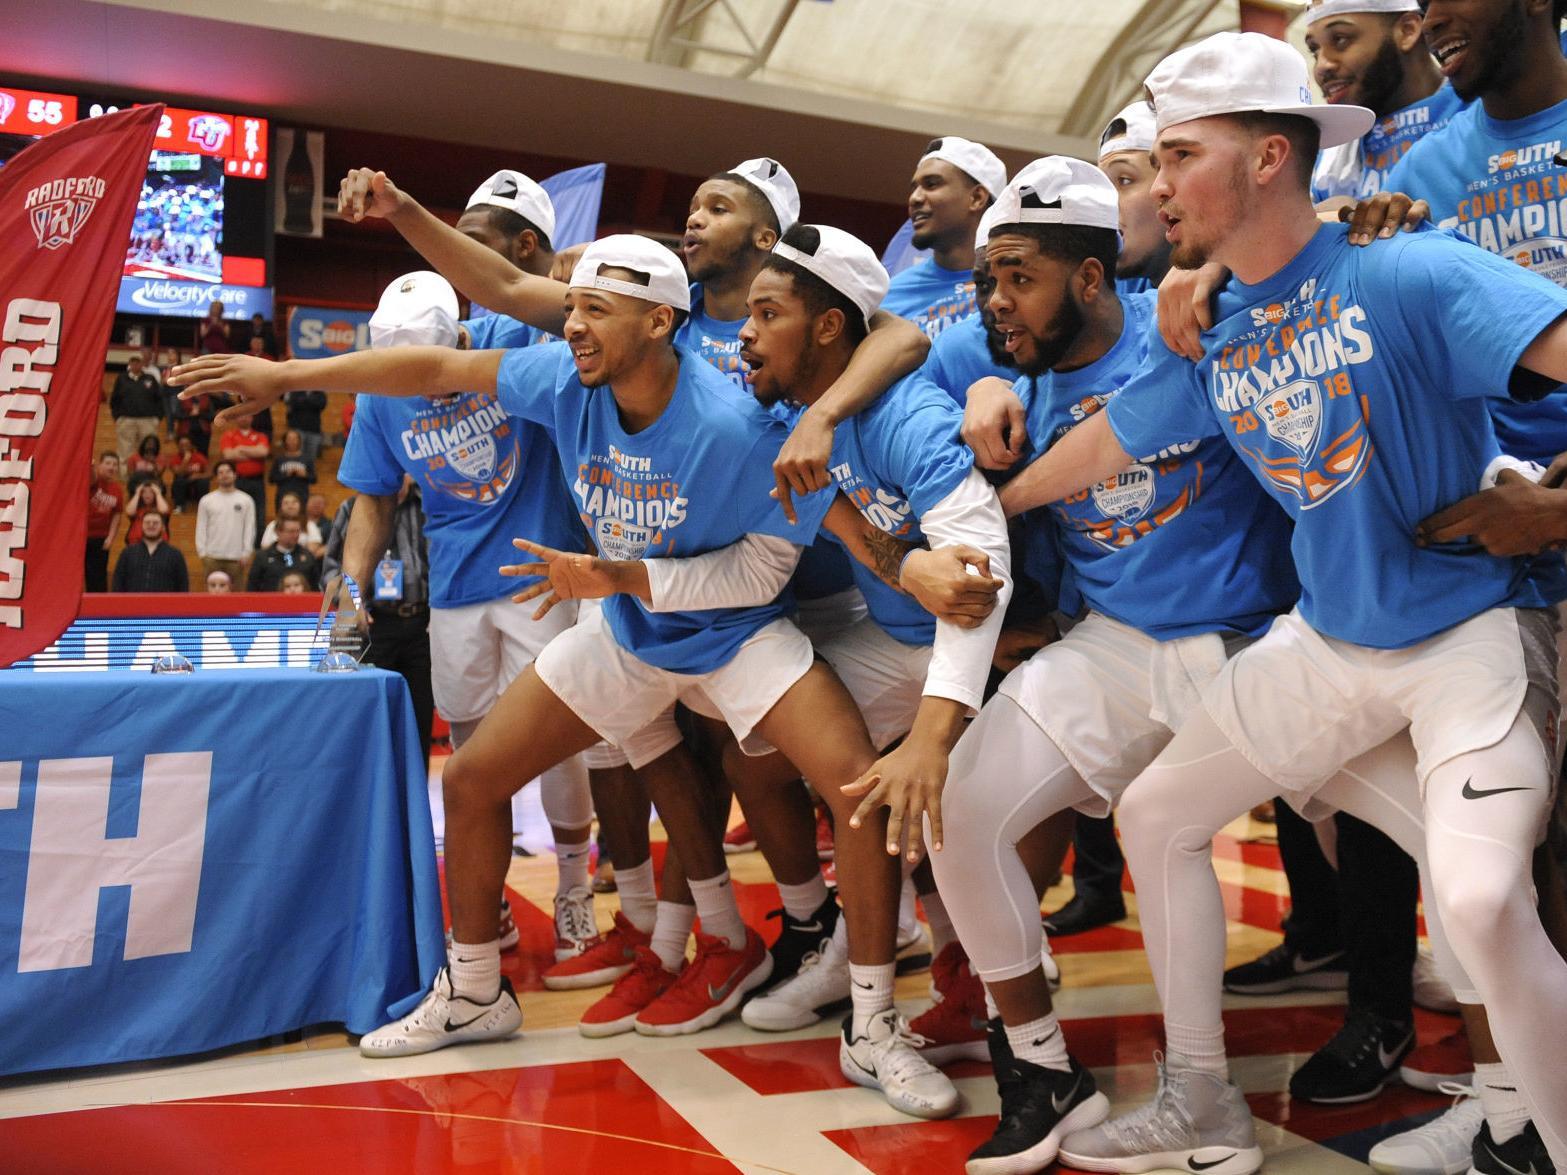 Virginia Tech And Radford To Have Selection Sunday Watch Parties Virginia Tech Roanoke Com